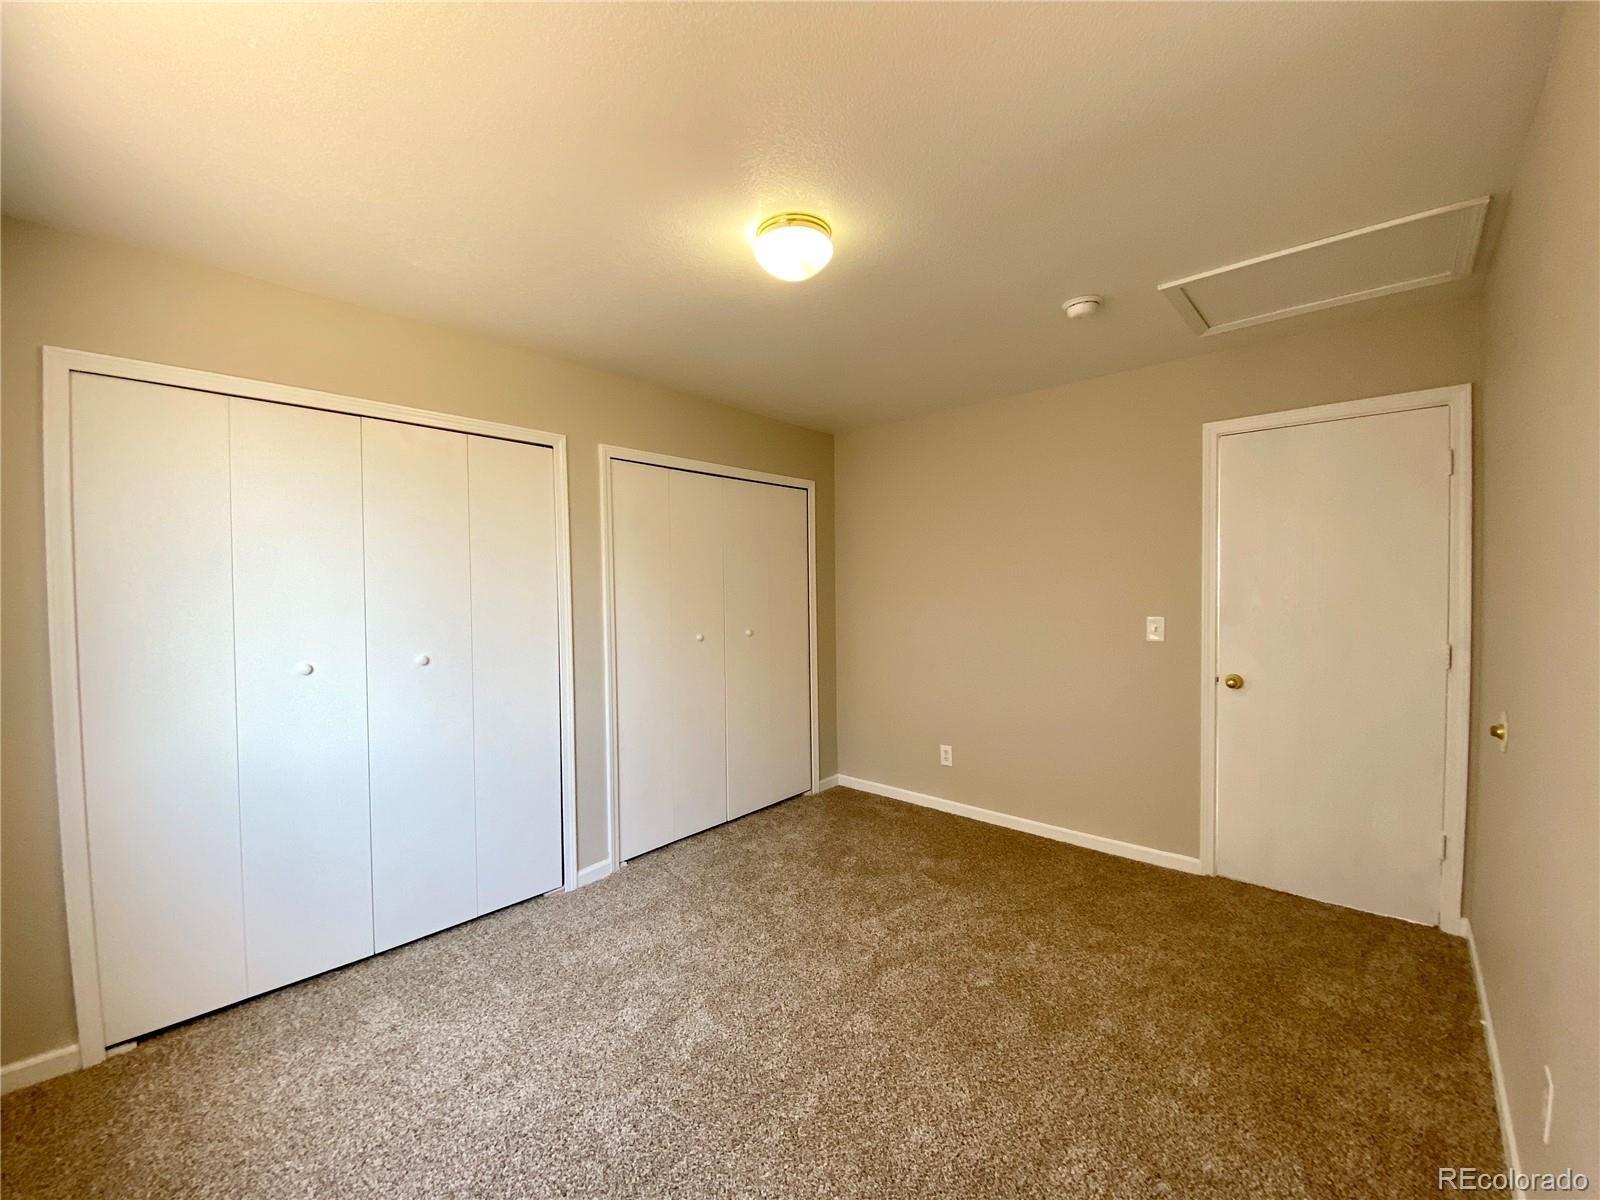 MLS# 6788673 - 9 - 5311 Suburban , Colorado Springs, CO 80911